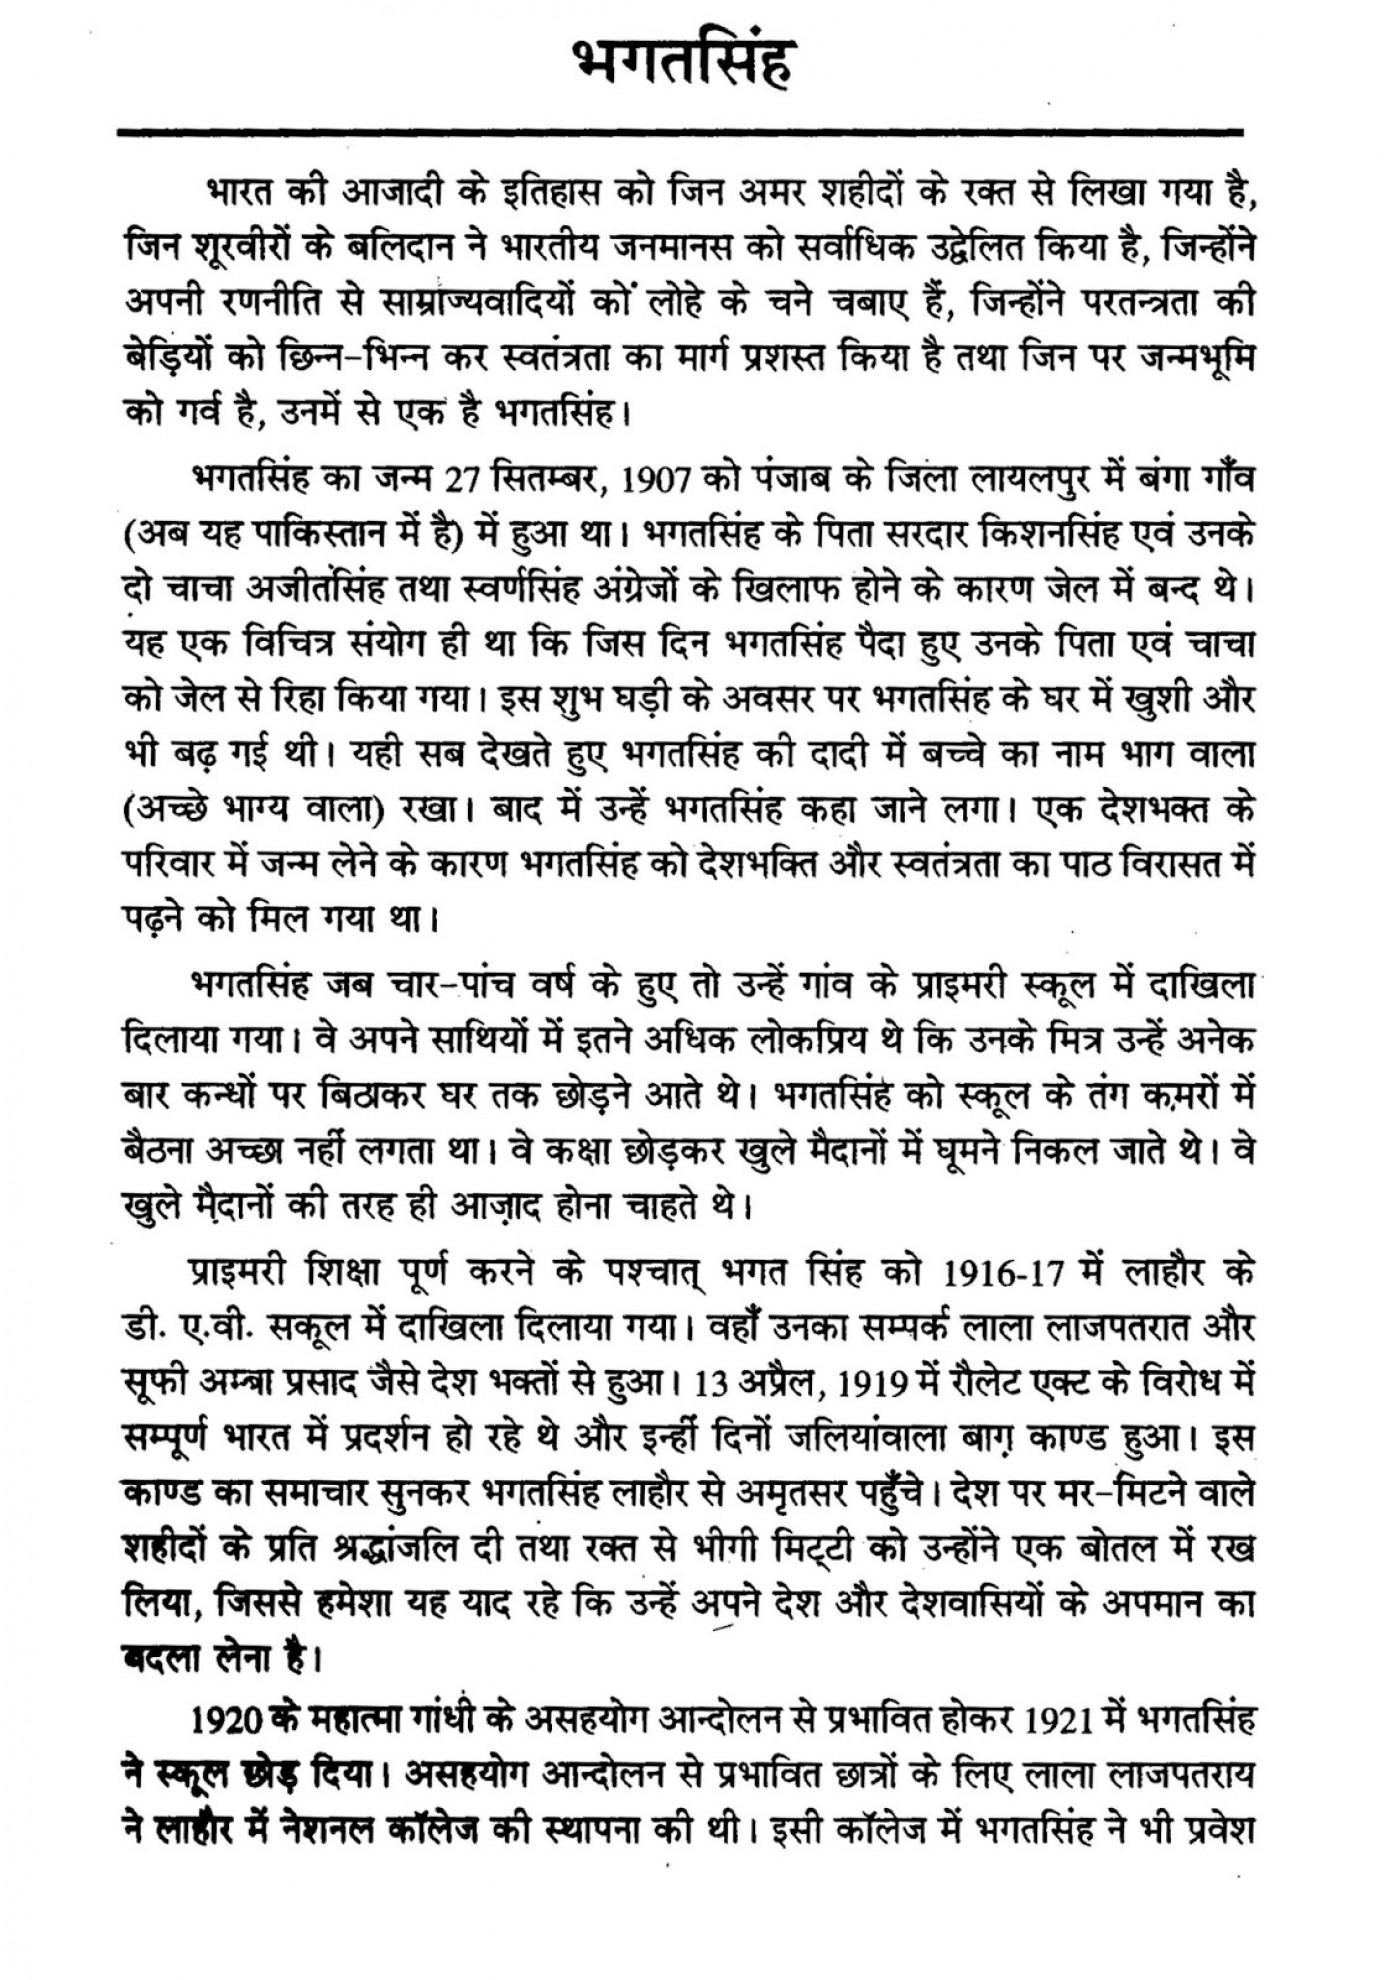 bhagat singh essay in marathi language